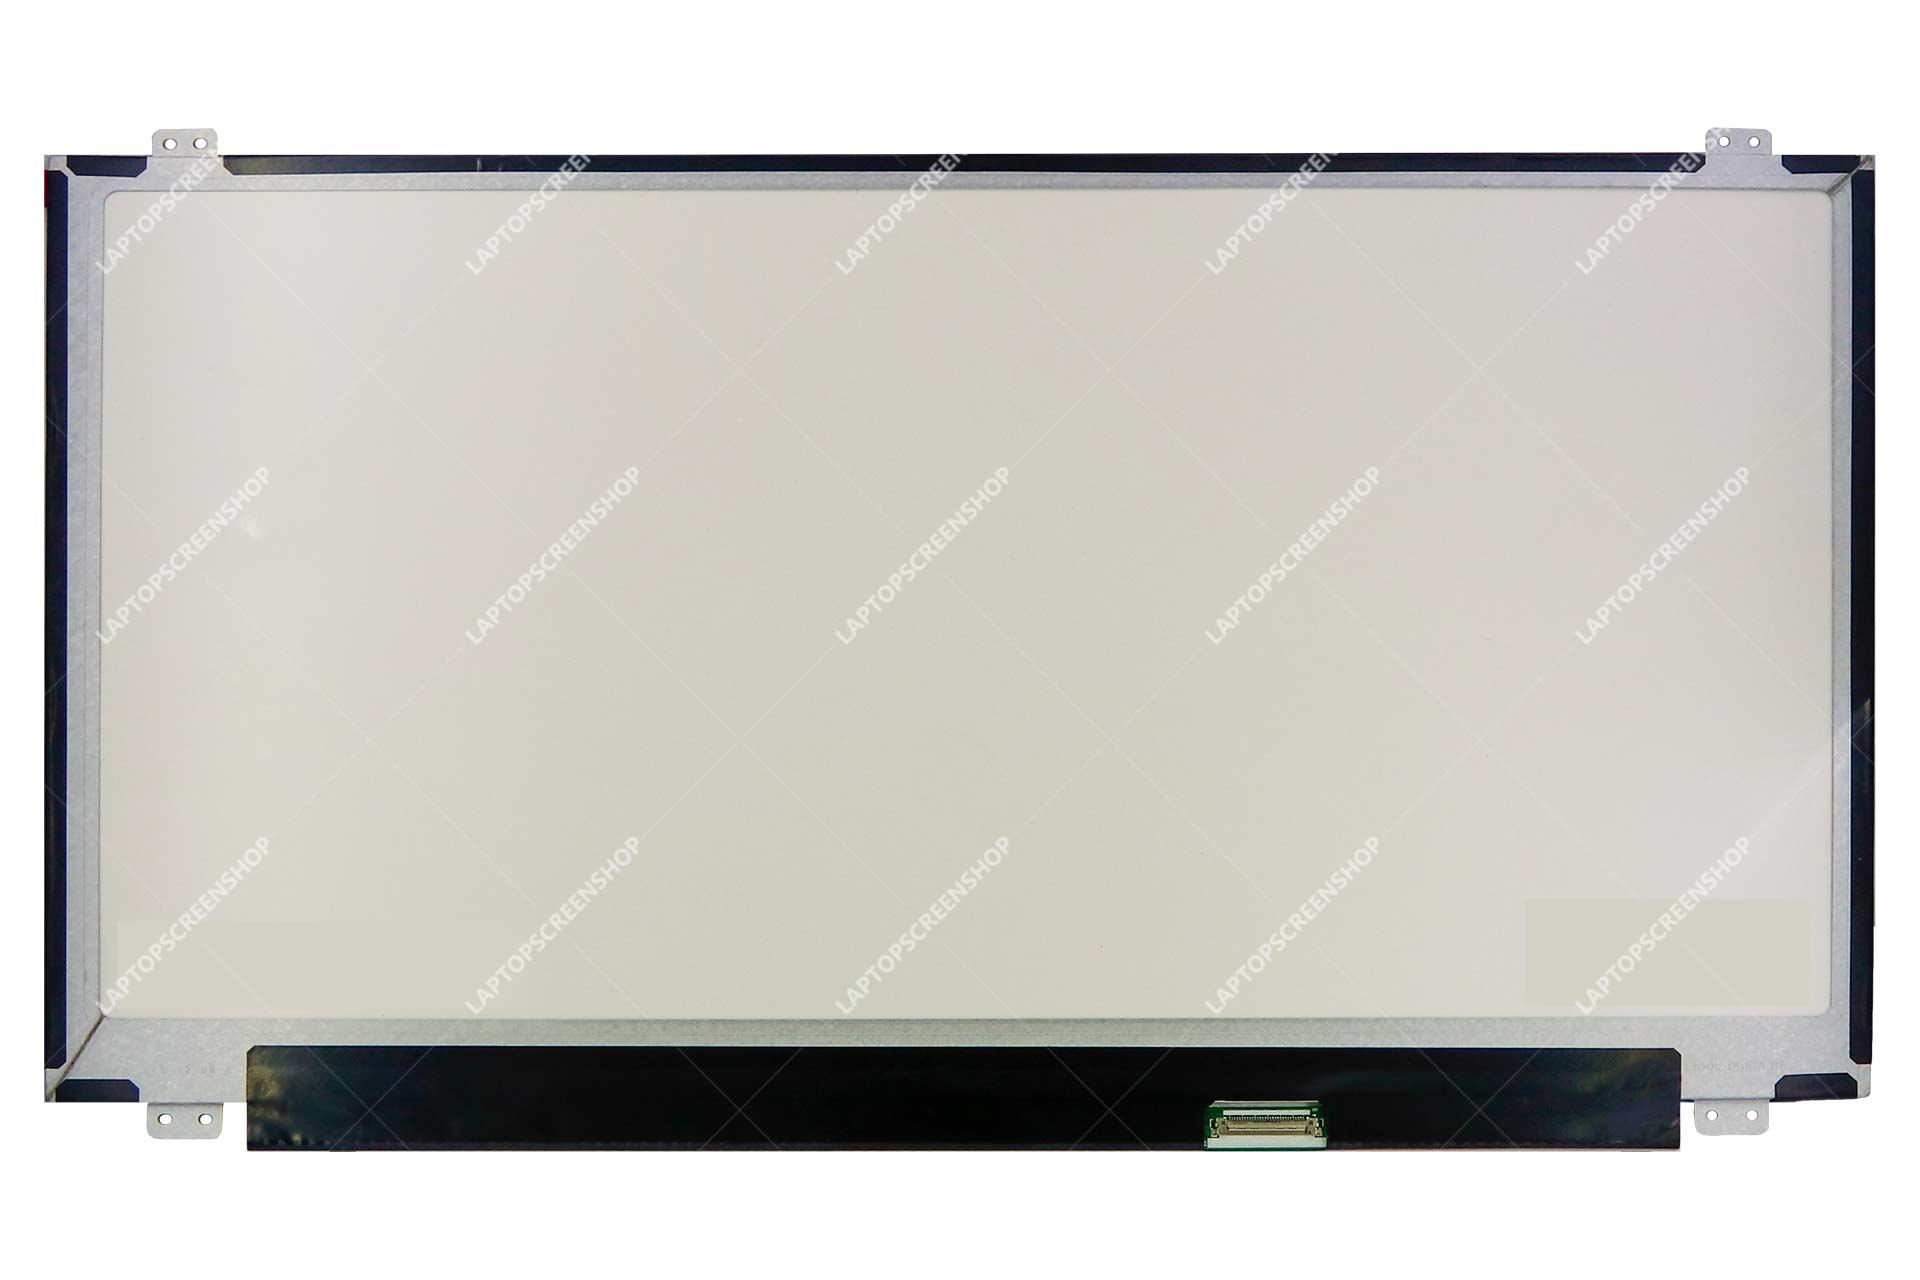 ACER-ASPIRE-E1-510-4457-LCD |HD|فروشگاه لپ تاپ اسکرين | تعمير لپ تاپ